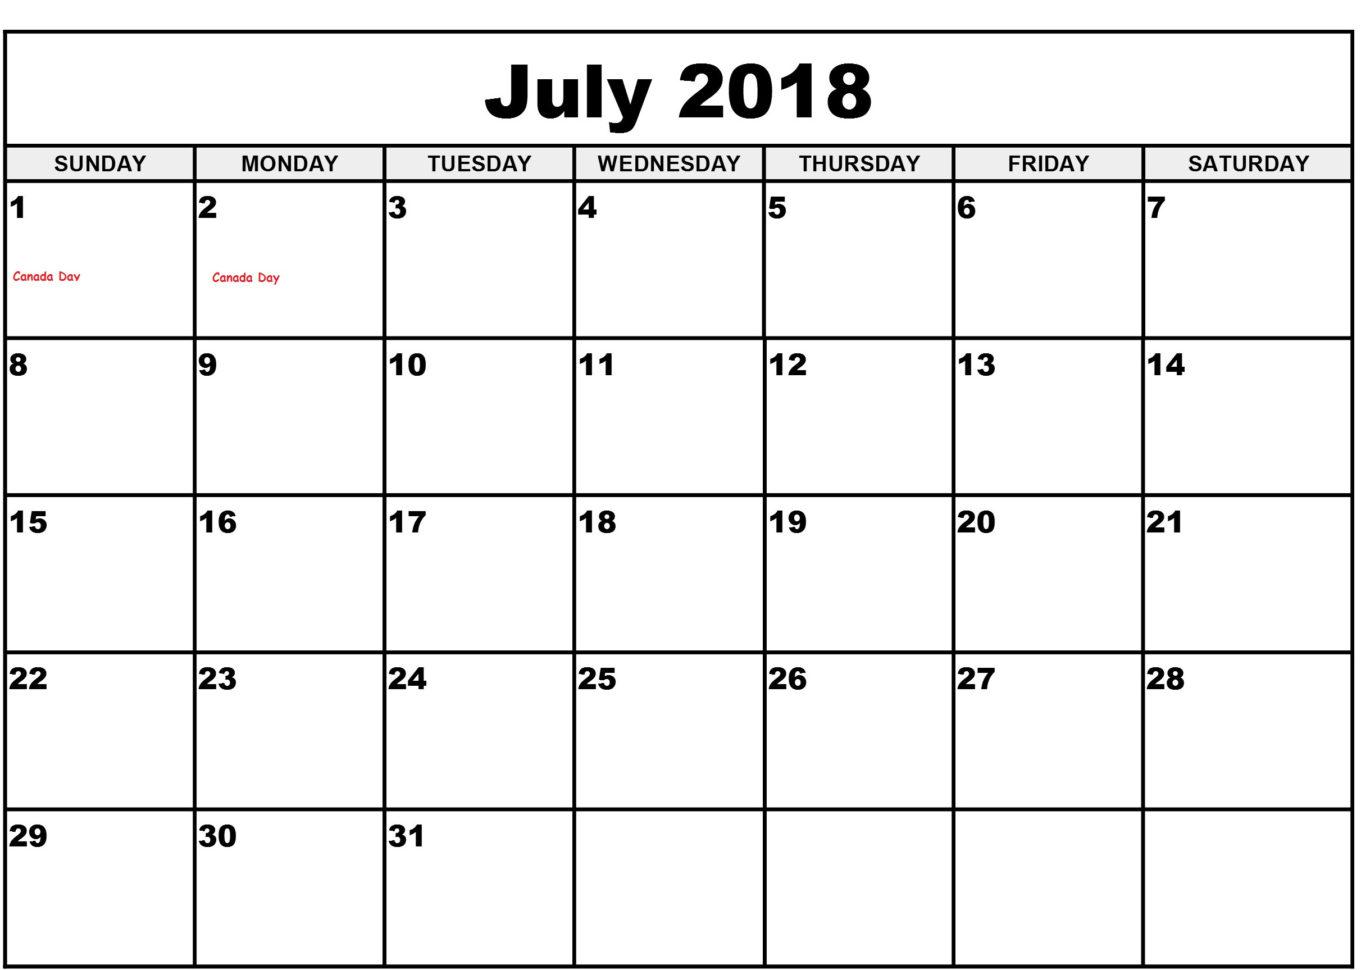 2018 Calendar Spreadsheet Google Sheets Pertaining To July 2019 Calendar Printable Templates  Site Provides Calendar